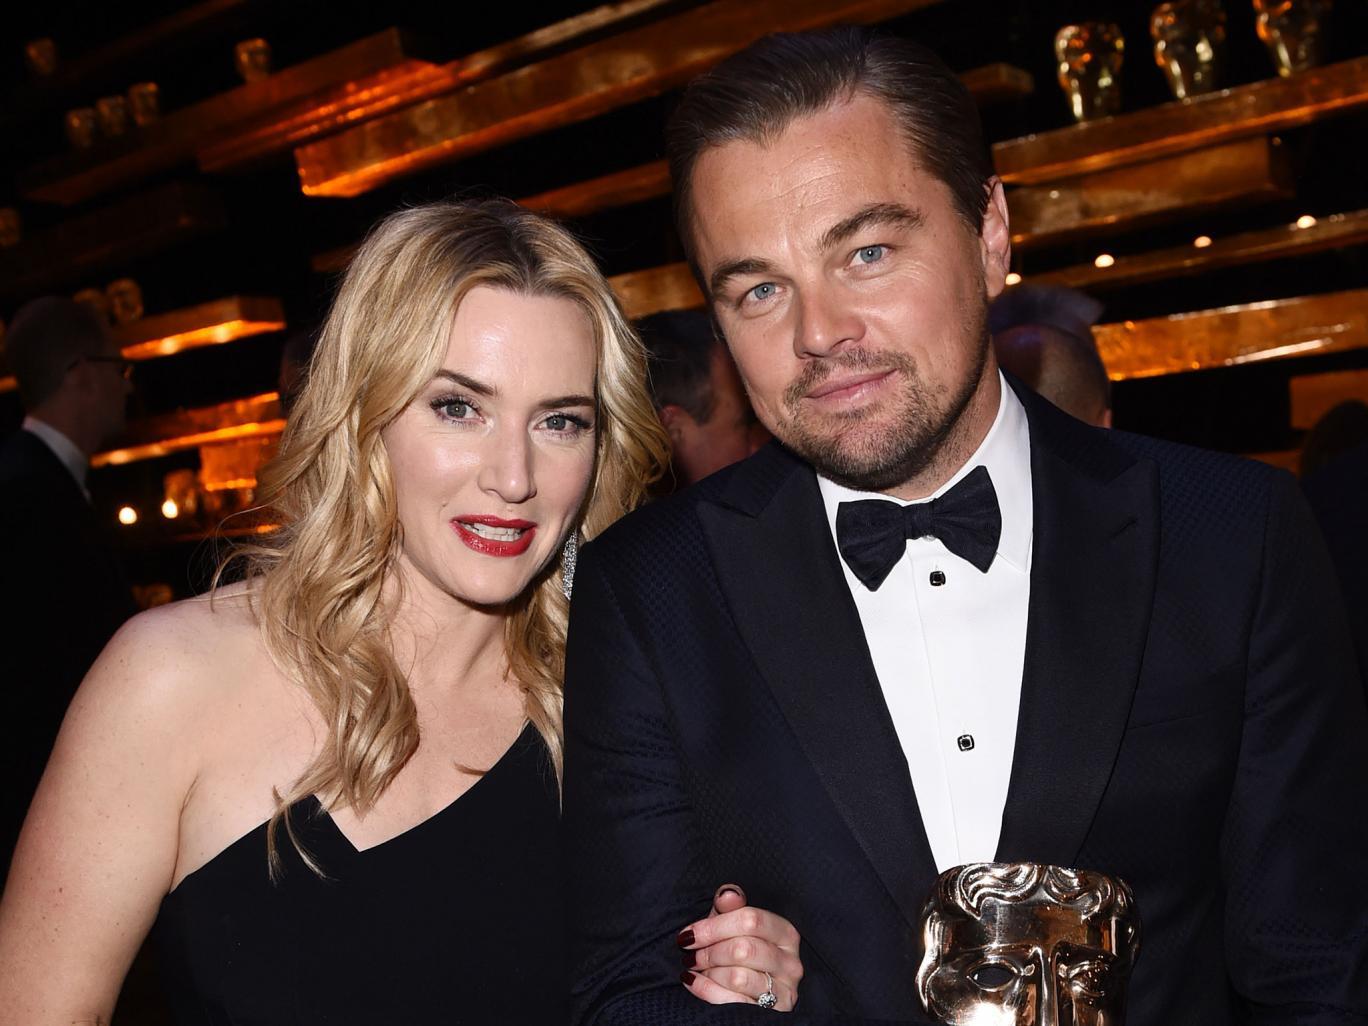 BAFTAs 2016: Leonardo DiCaprio wins best actor as The Revenant dominates